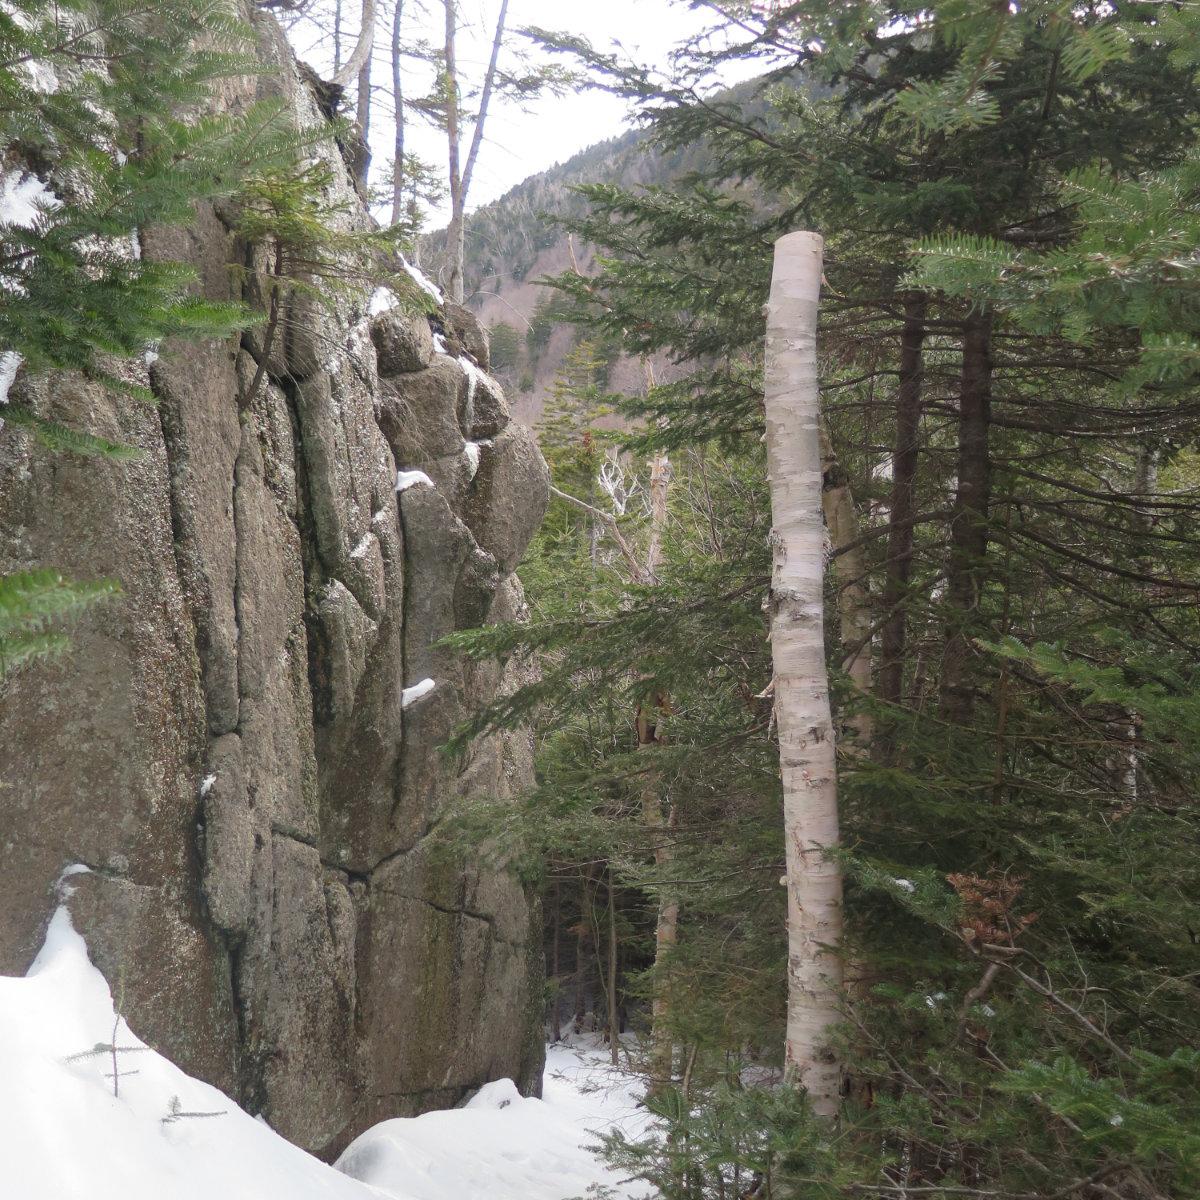 Oliverian-Trail-Square-Ledge-Granite-Wall-20200326